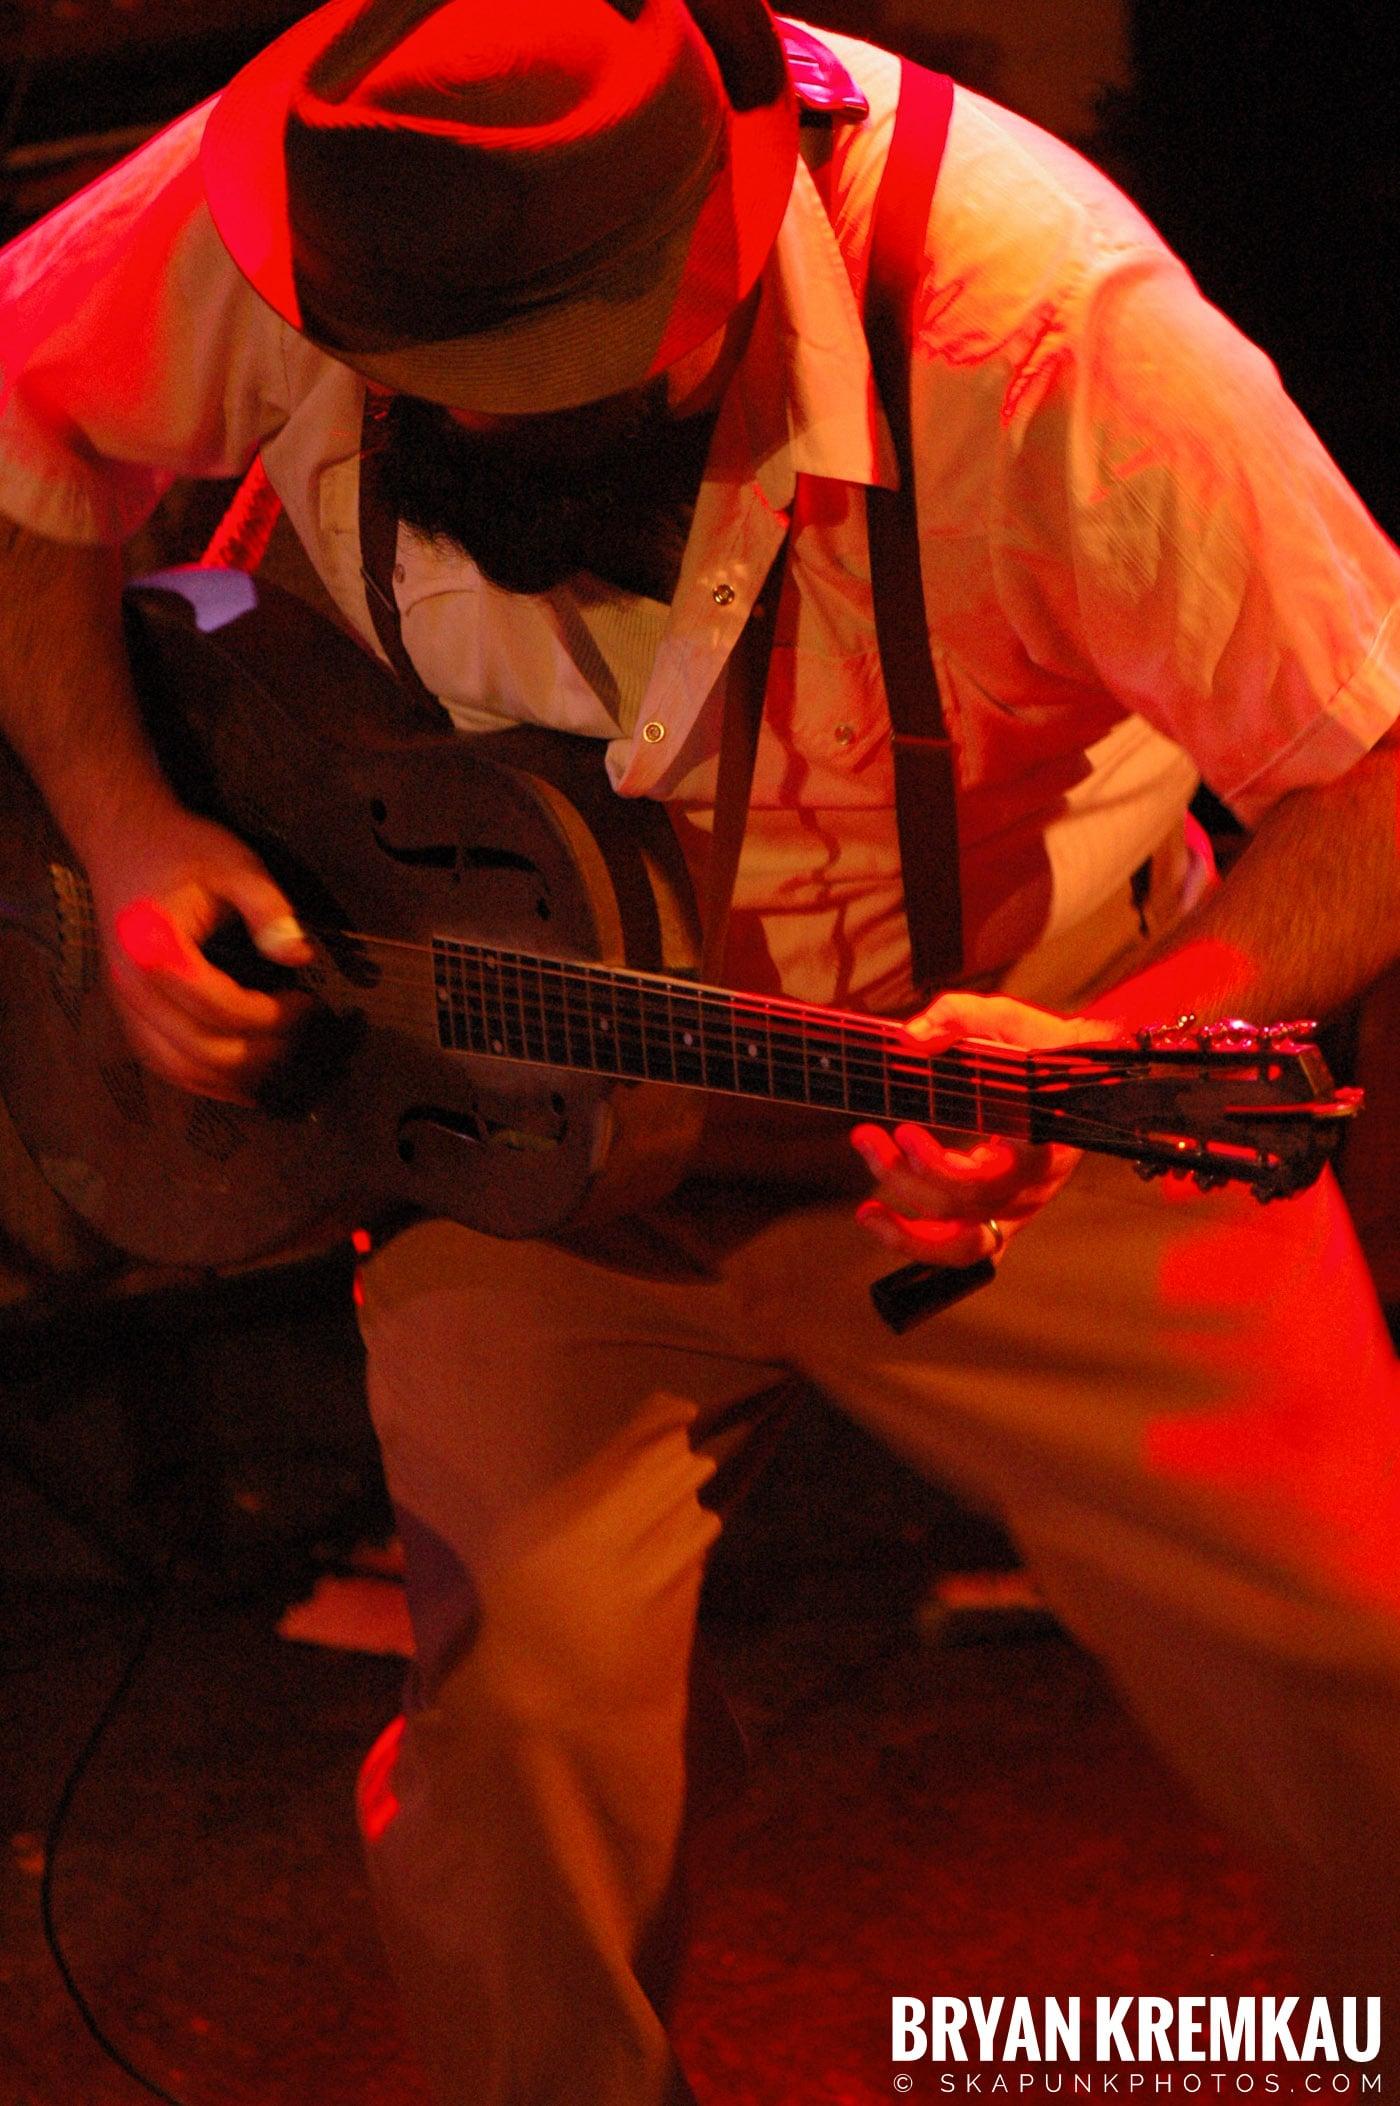 Rev. Peyton's Big Damn Band @ The Chance, Poughkeepsie NY - 2.21.08 (6)